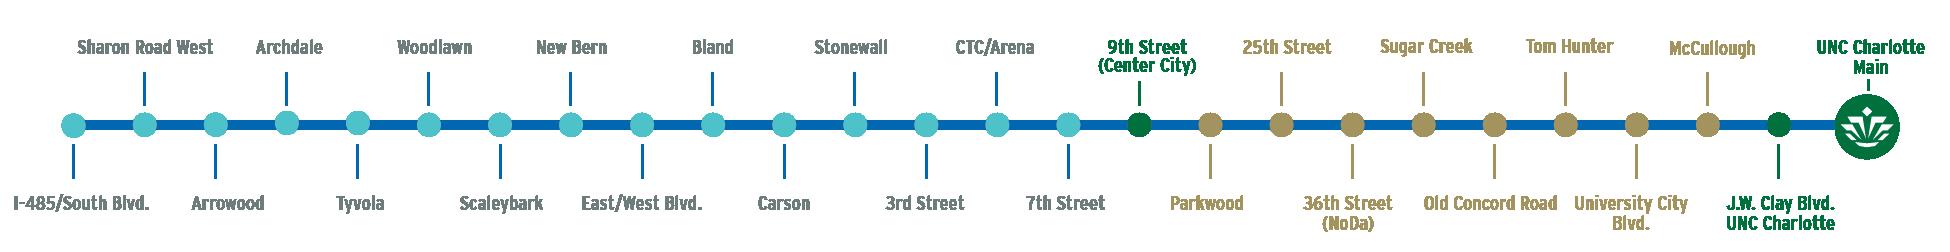 Horizontal Light Rail Map_Cropped